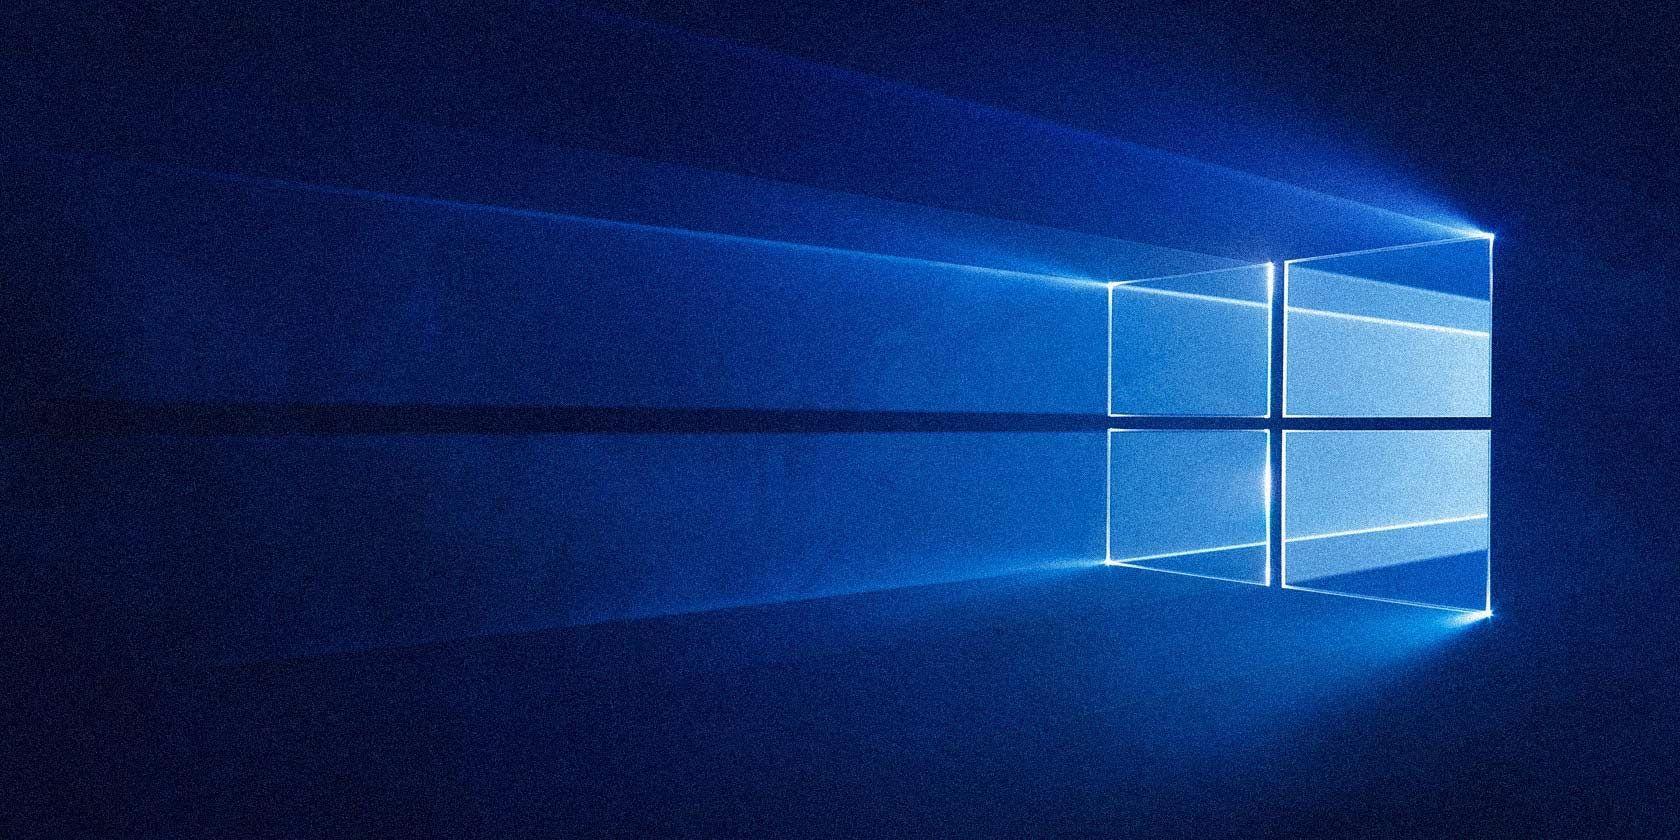 Windows MakeUseOf Windows software, Windows operating